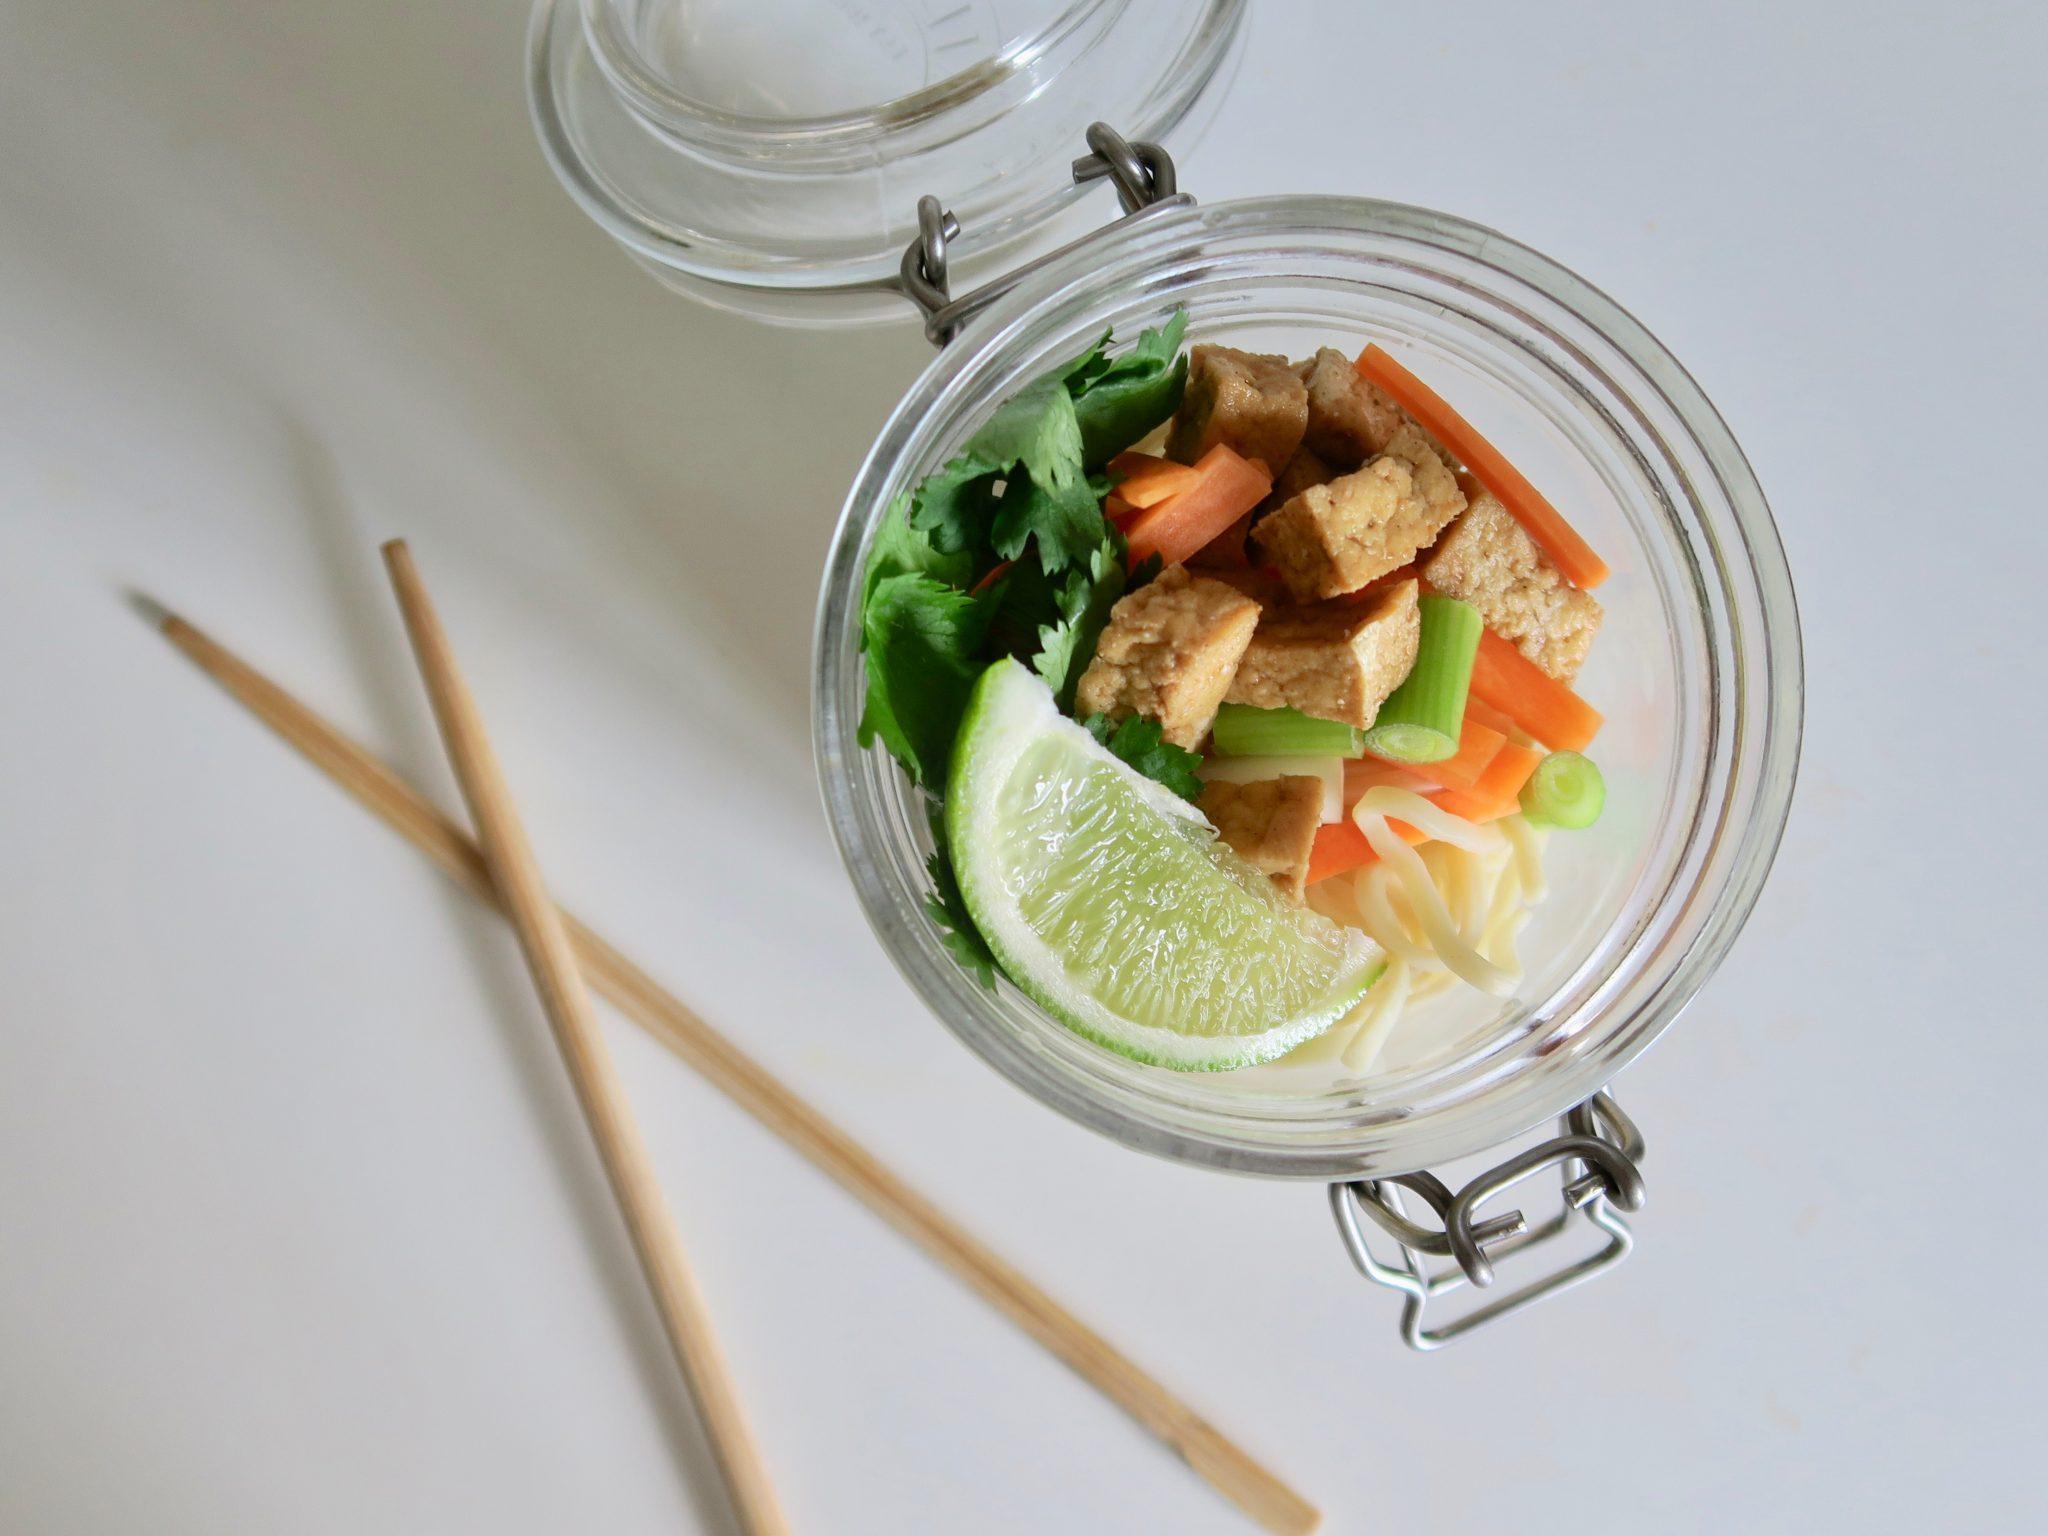 Teriyaki Tofu and Noodles Recipe